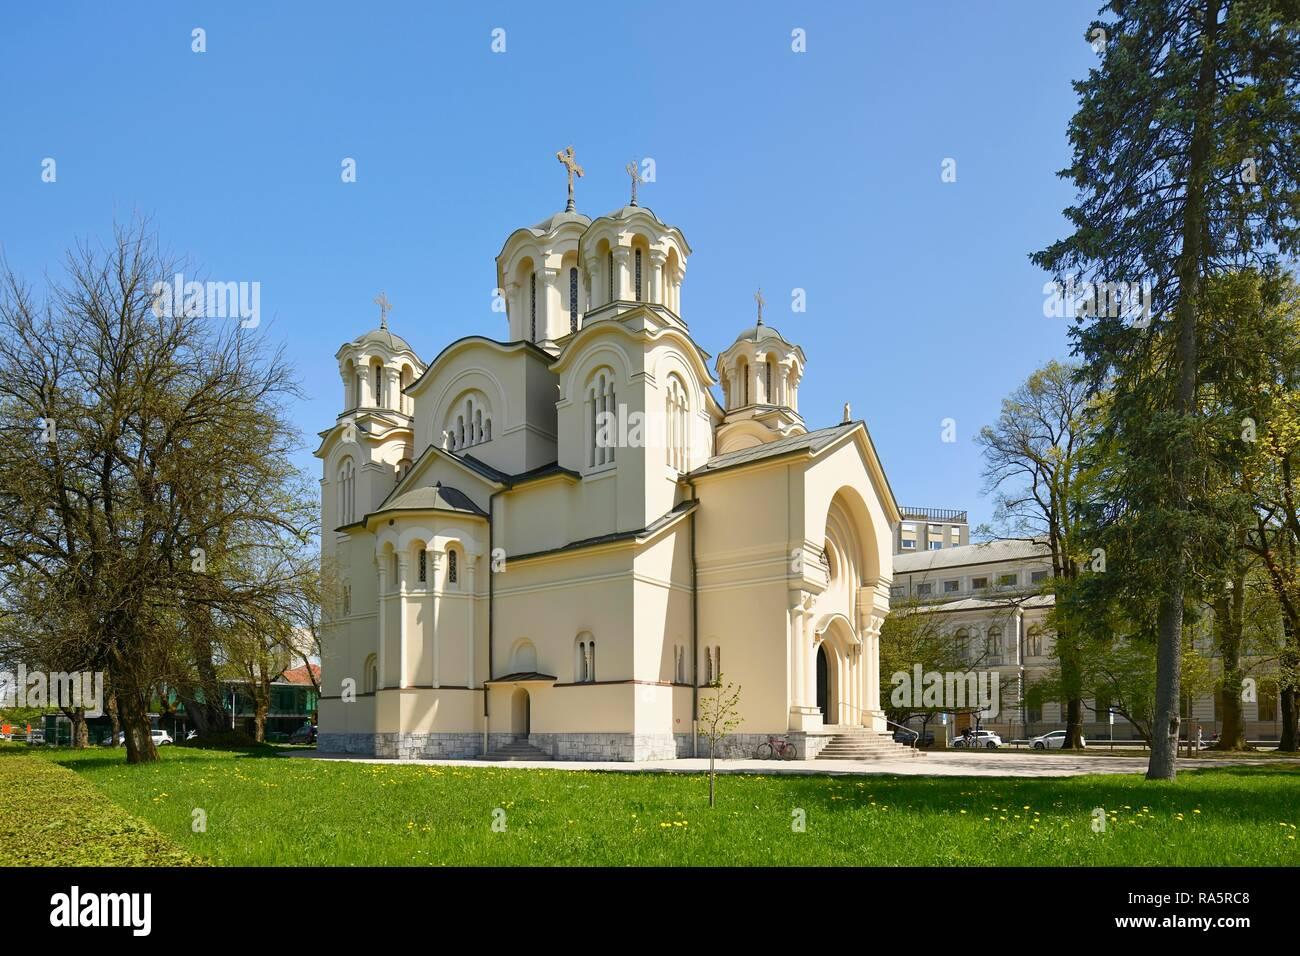 Serbian Orthodox Church of St. Cyril and Methodius, Ljubljana, Slovenia - Stock Image